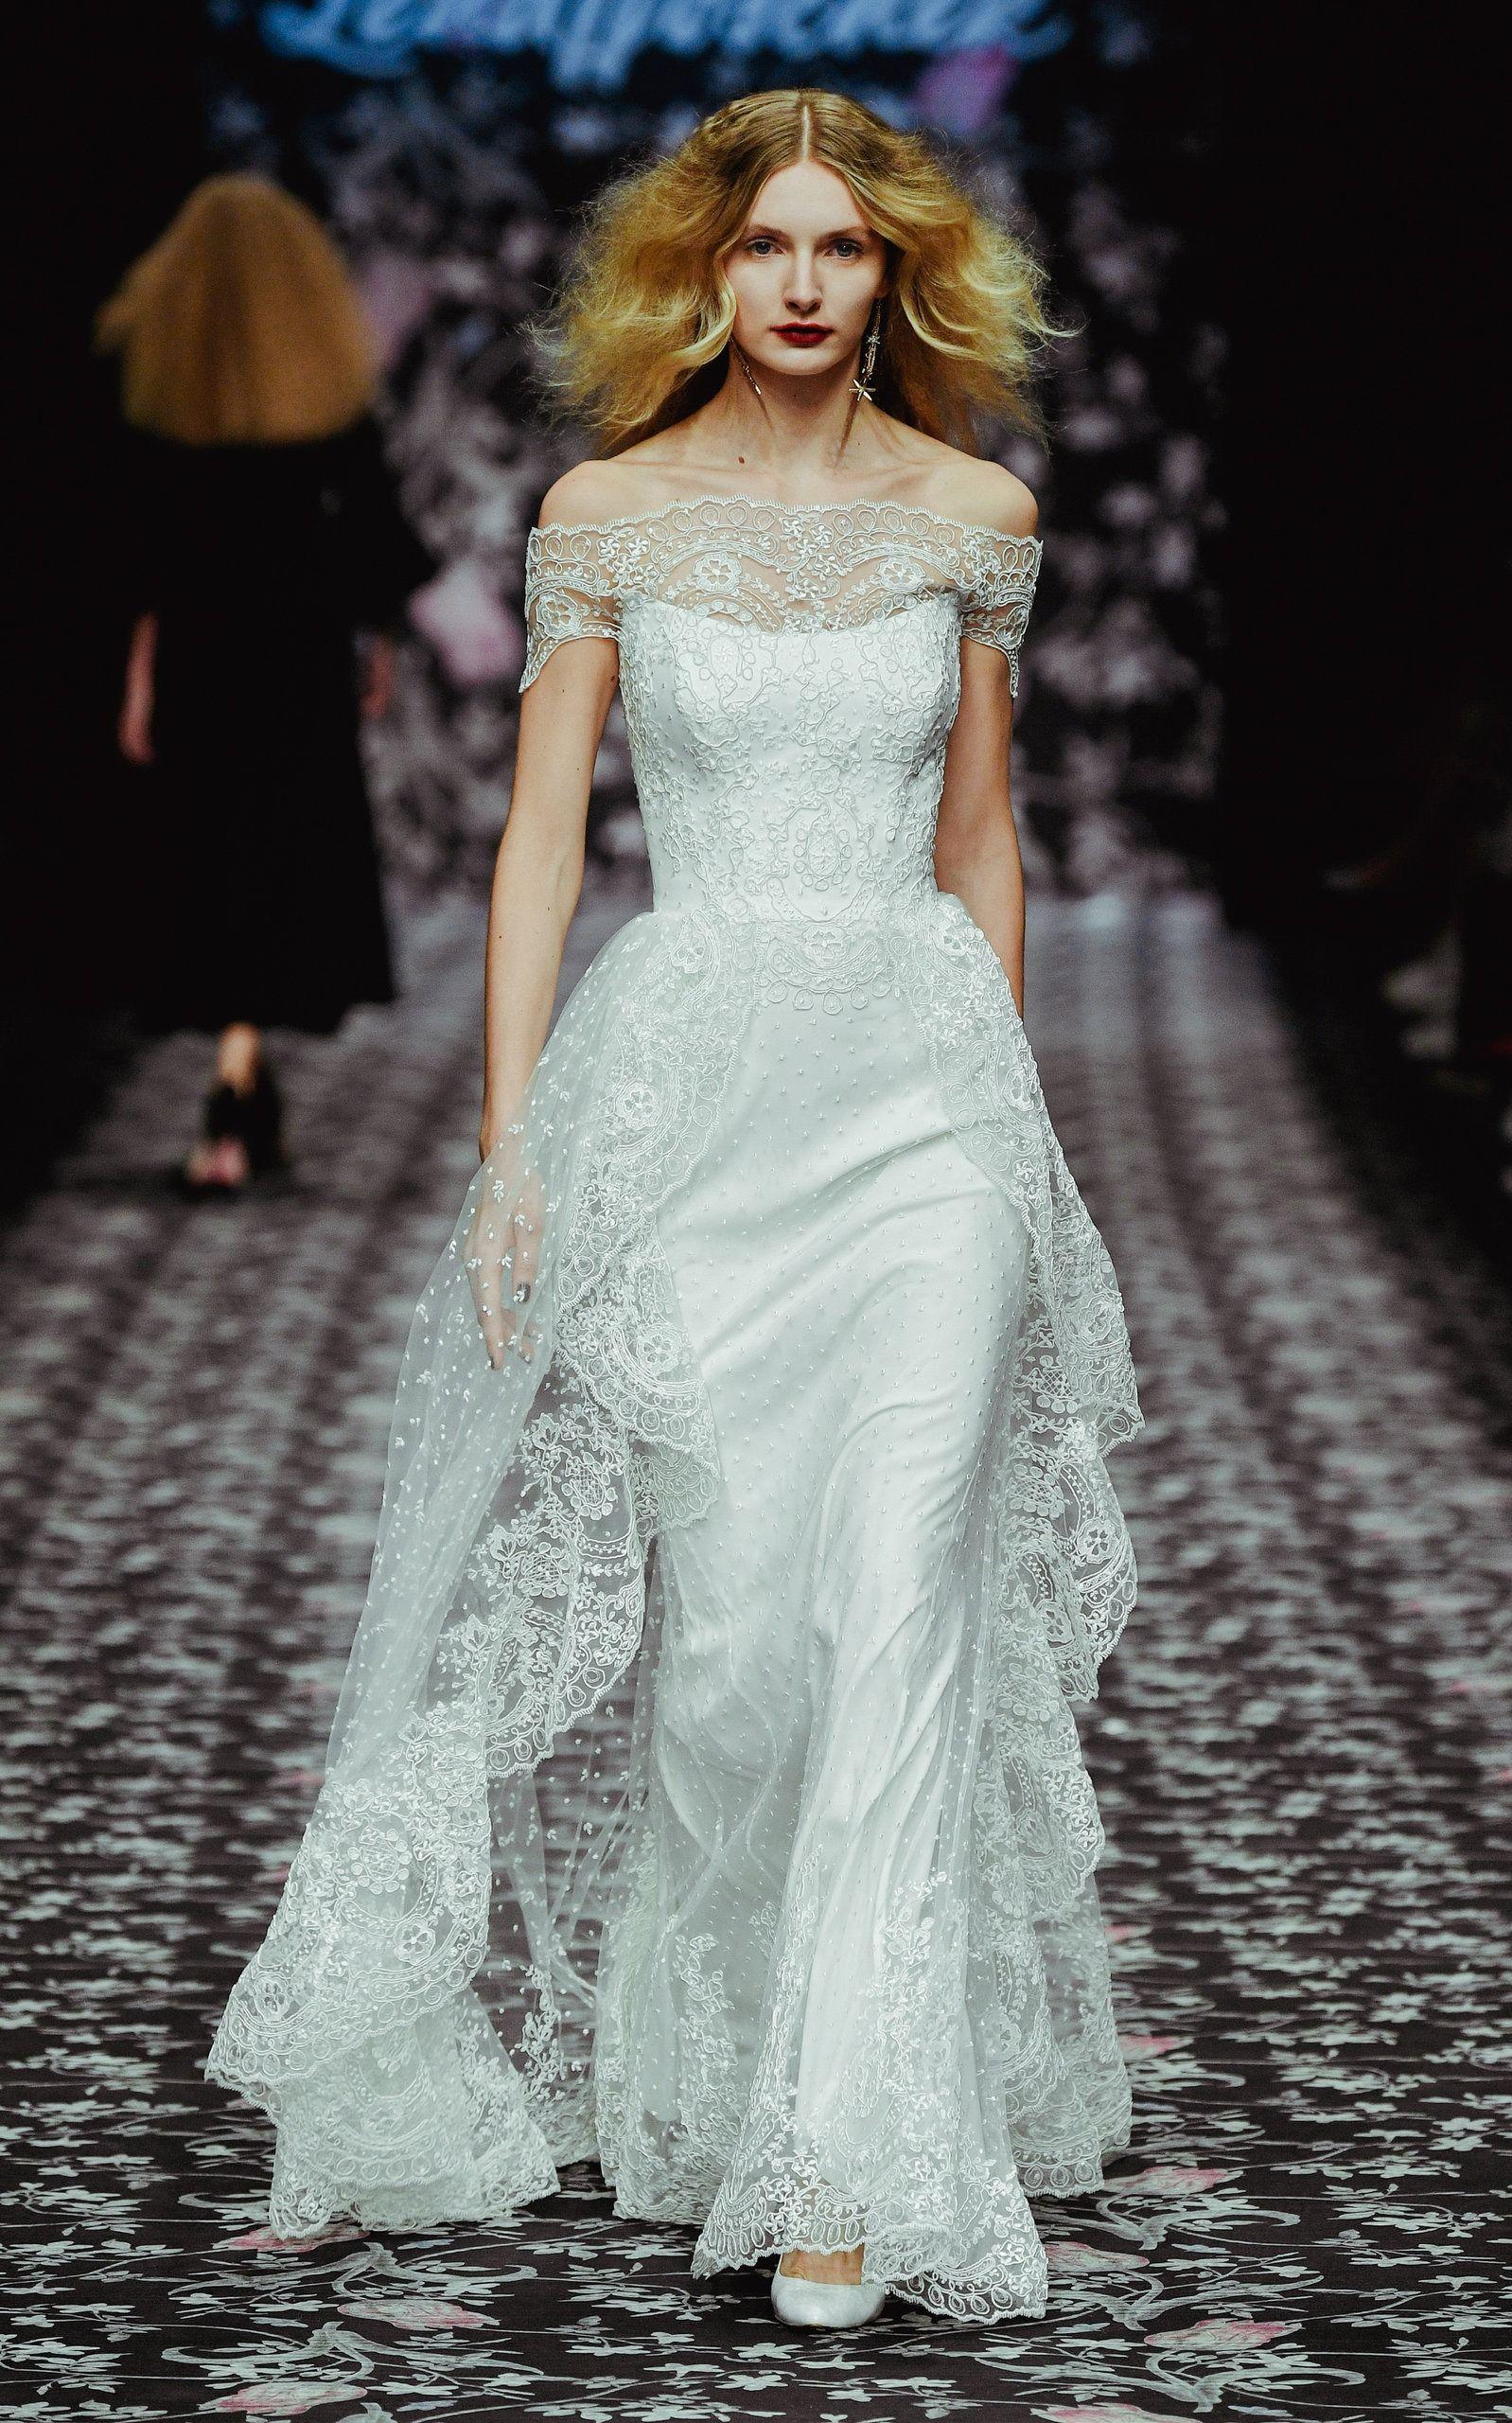 Lena Hoschek Ceremony Couture Wedding Dress  Couture brautkleider